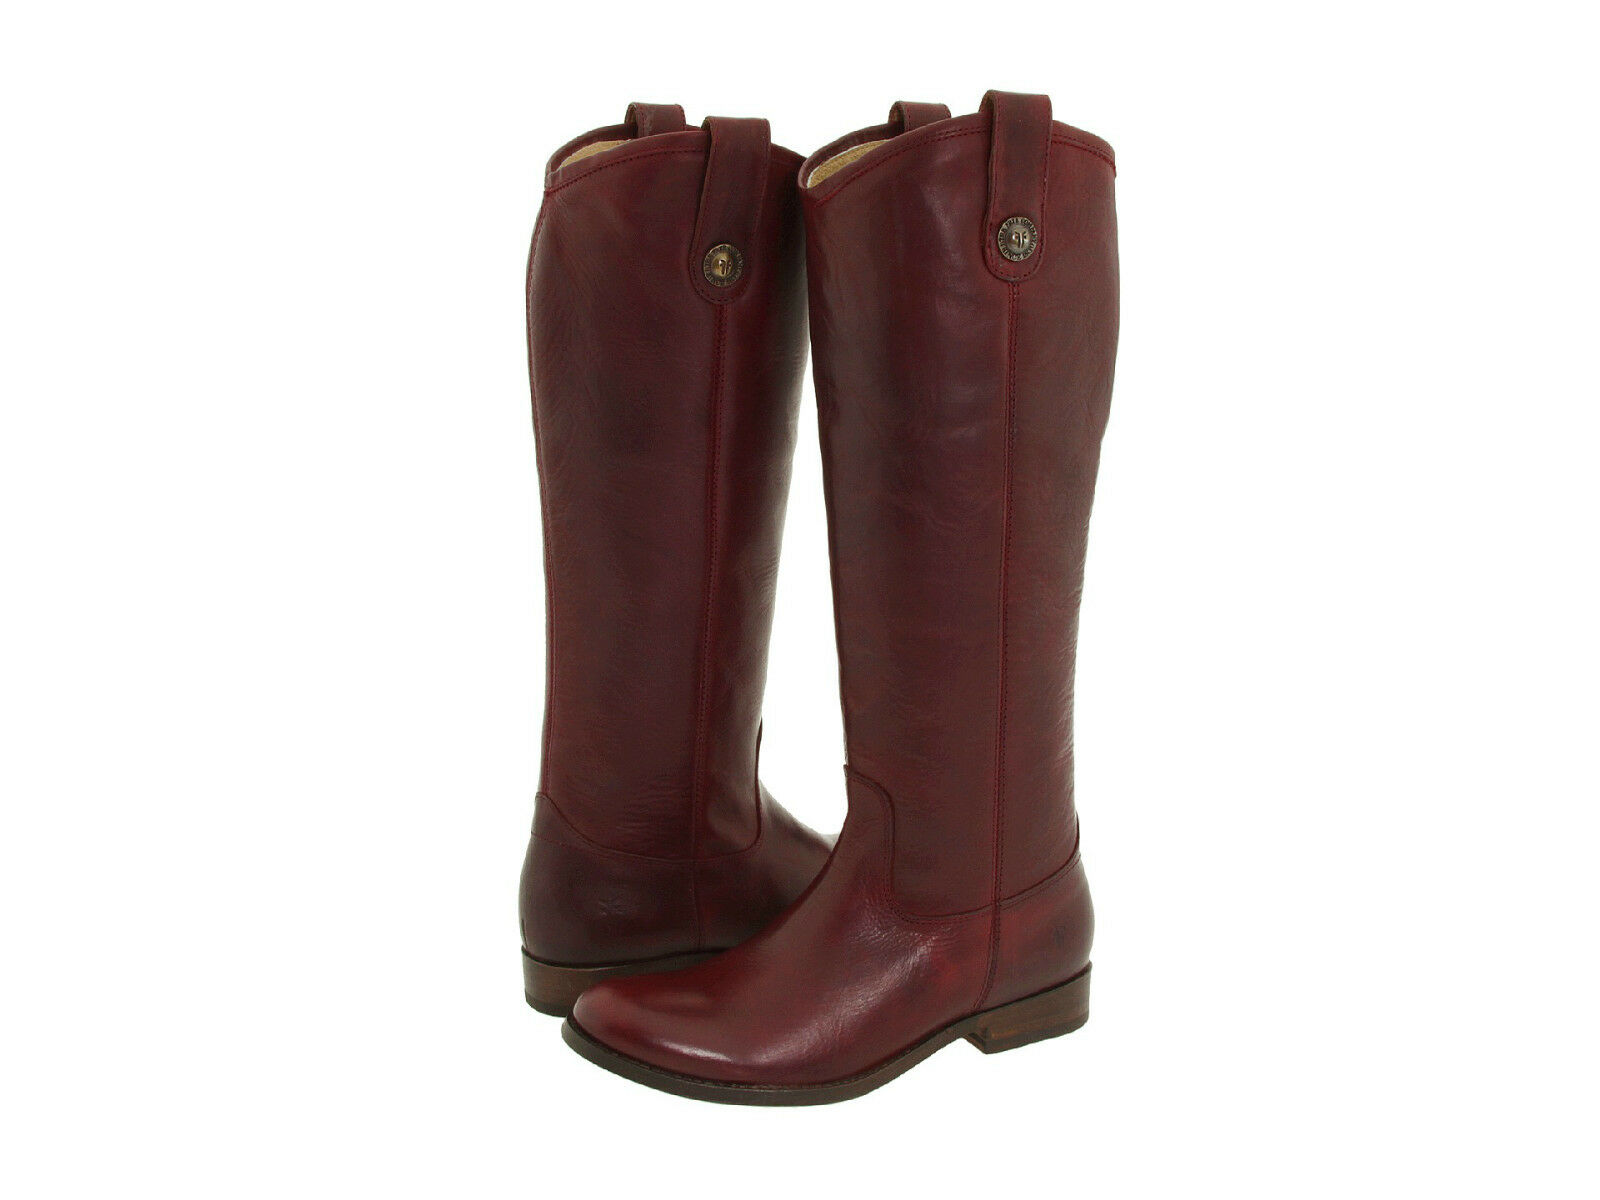 Frye Melissa Button Boots Bordeaux Western Riding Equestrian Retail NIB $348 NIB Retail New 5df4e8